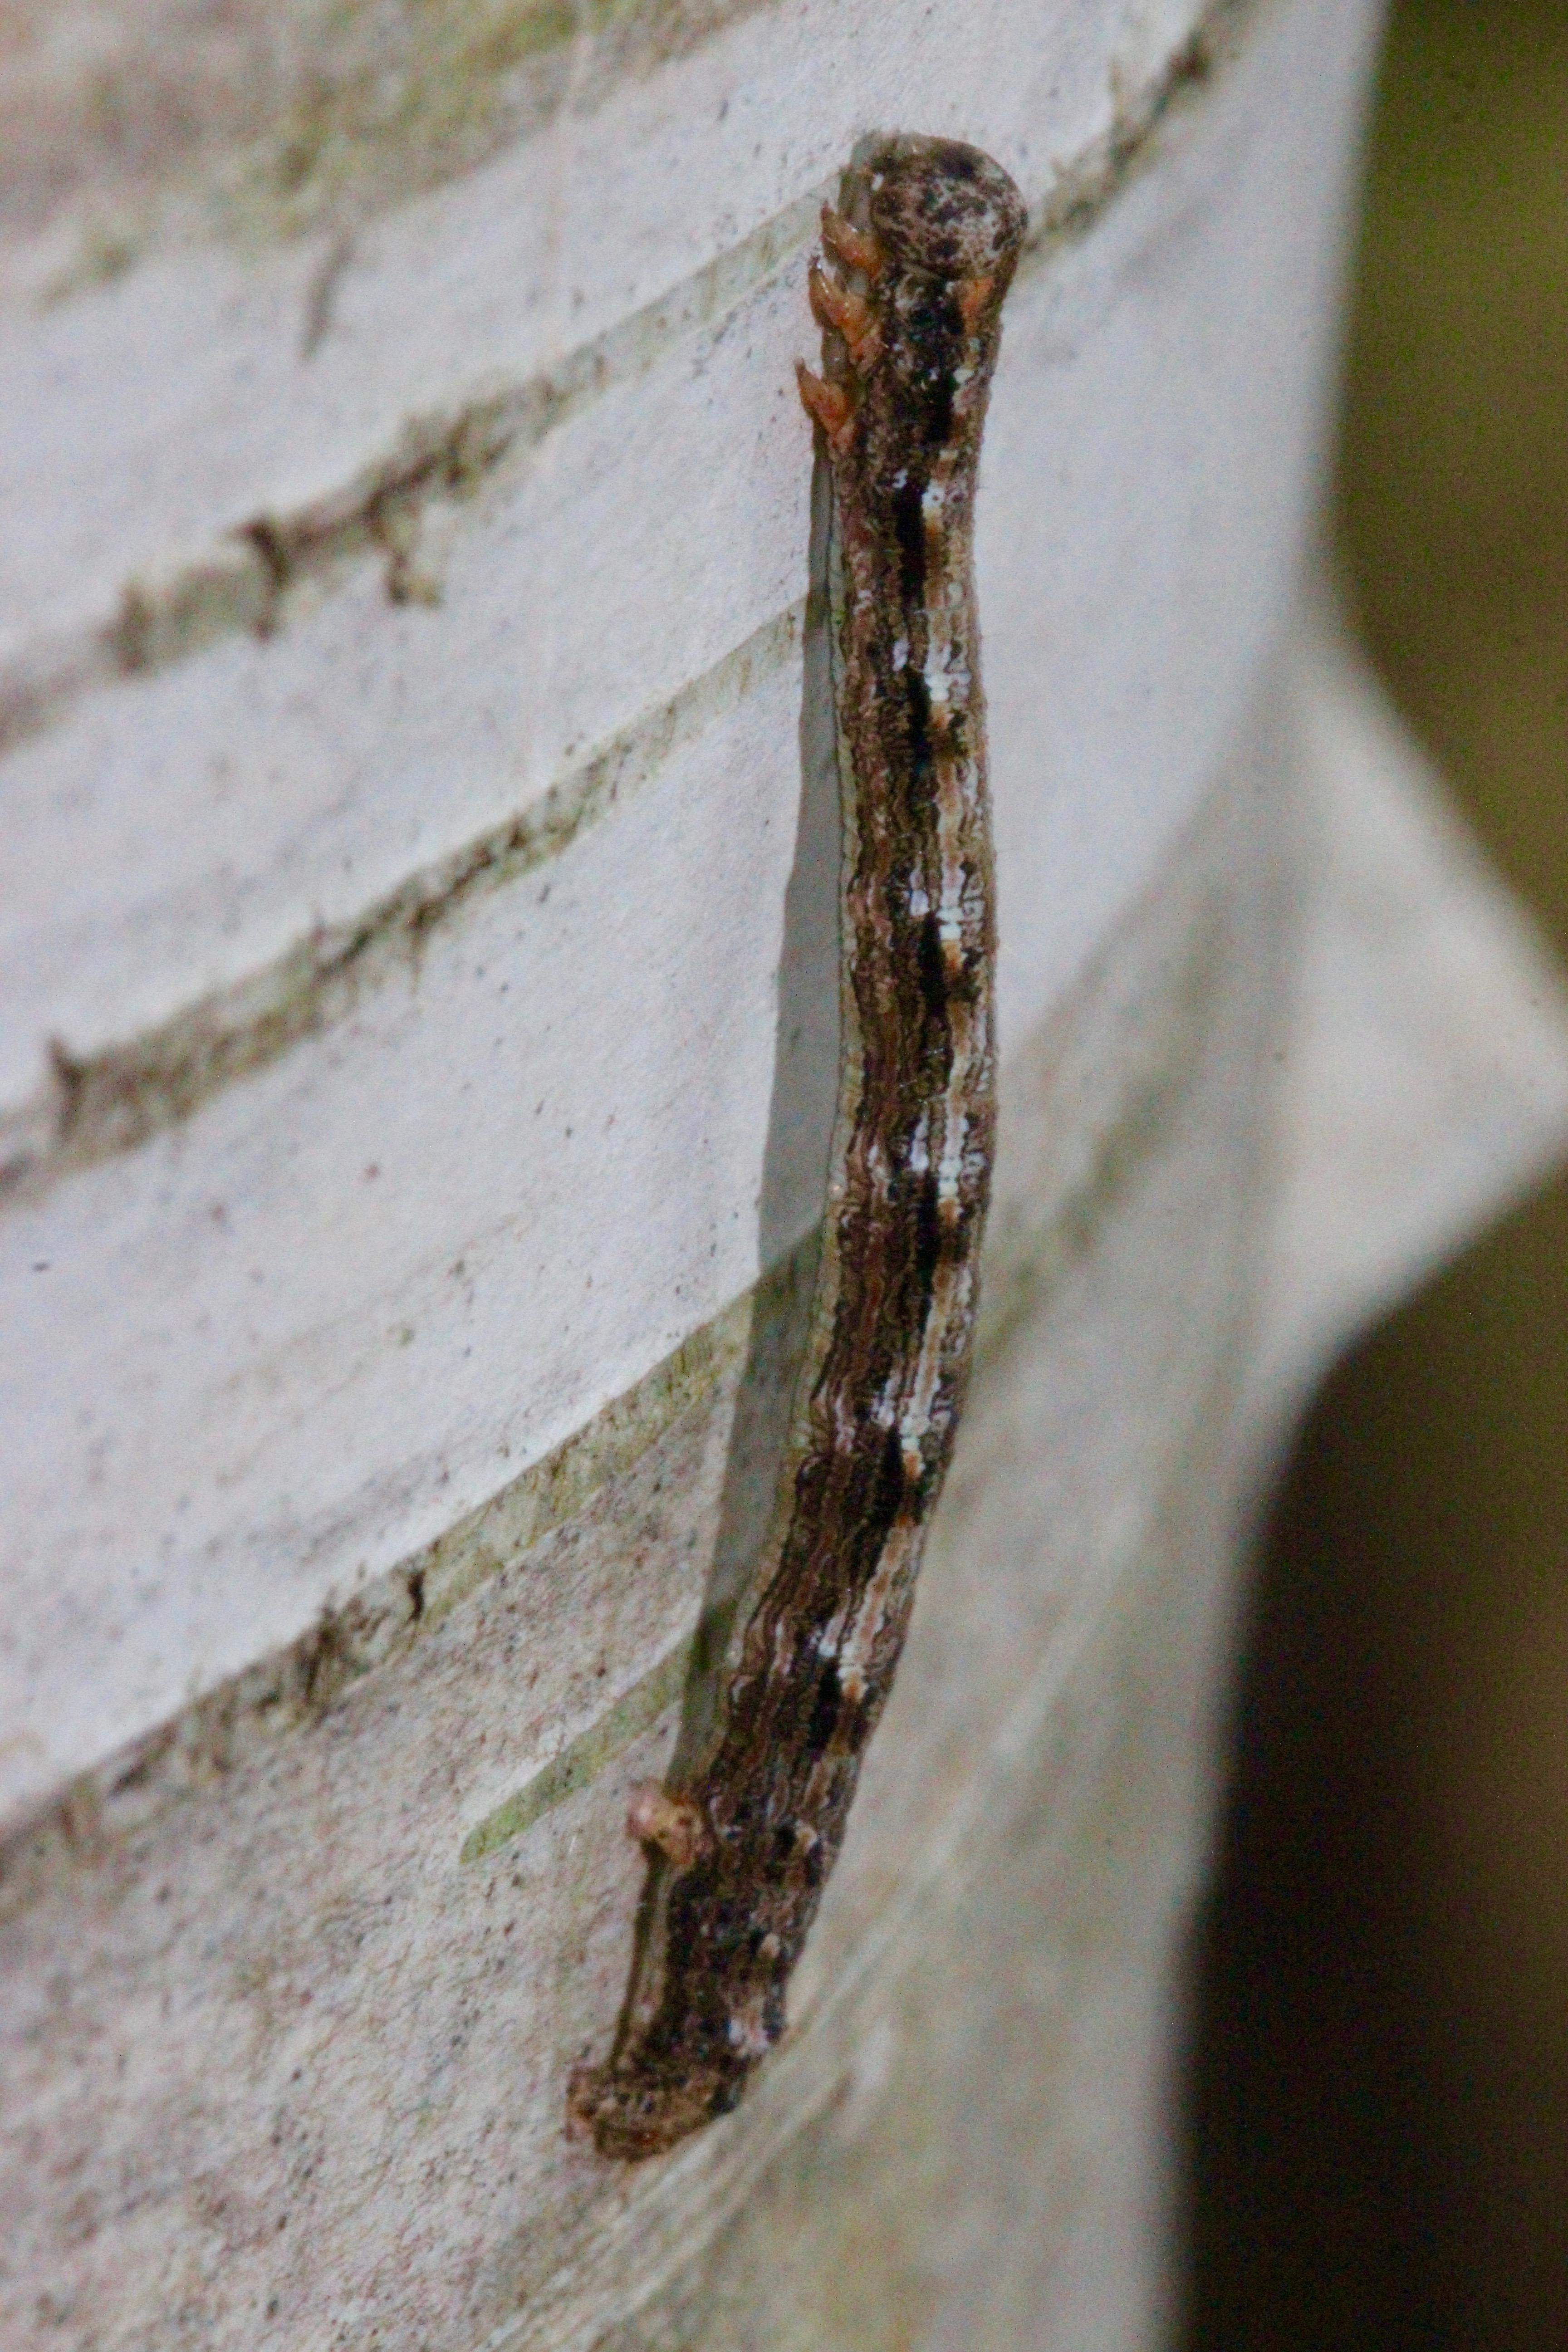 h-inch worm